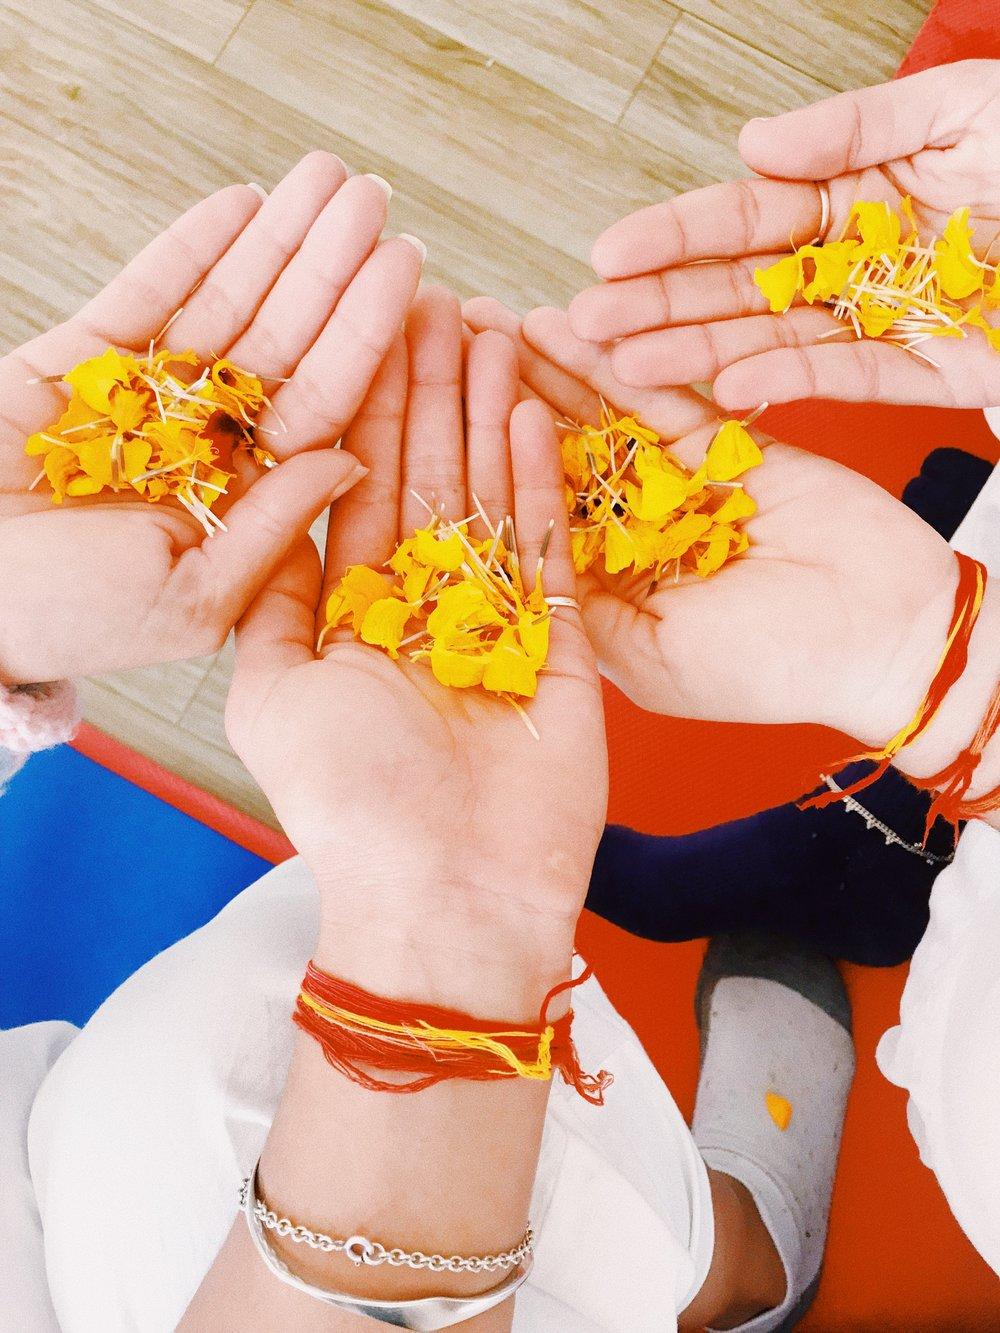 ceremonial flower petals